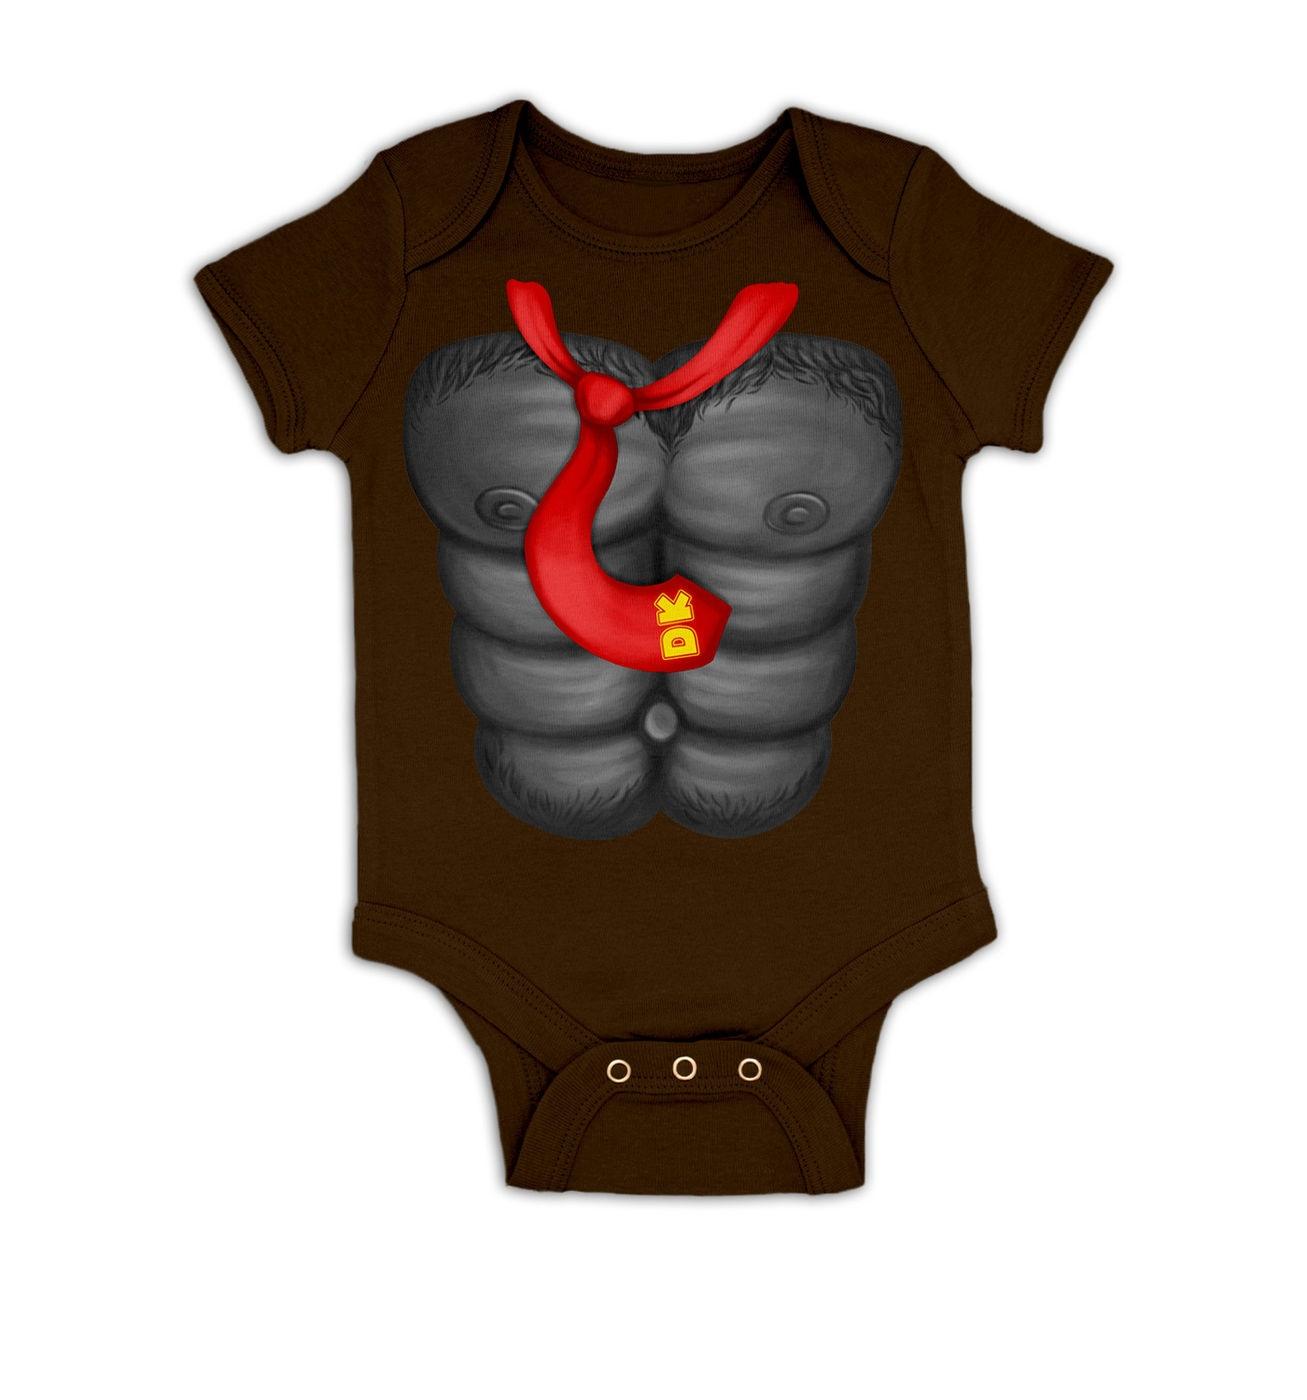 DK Costume baby grow by Something Geeky